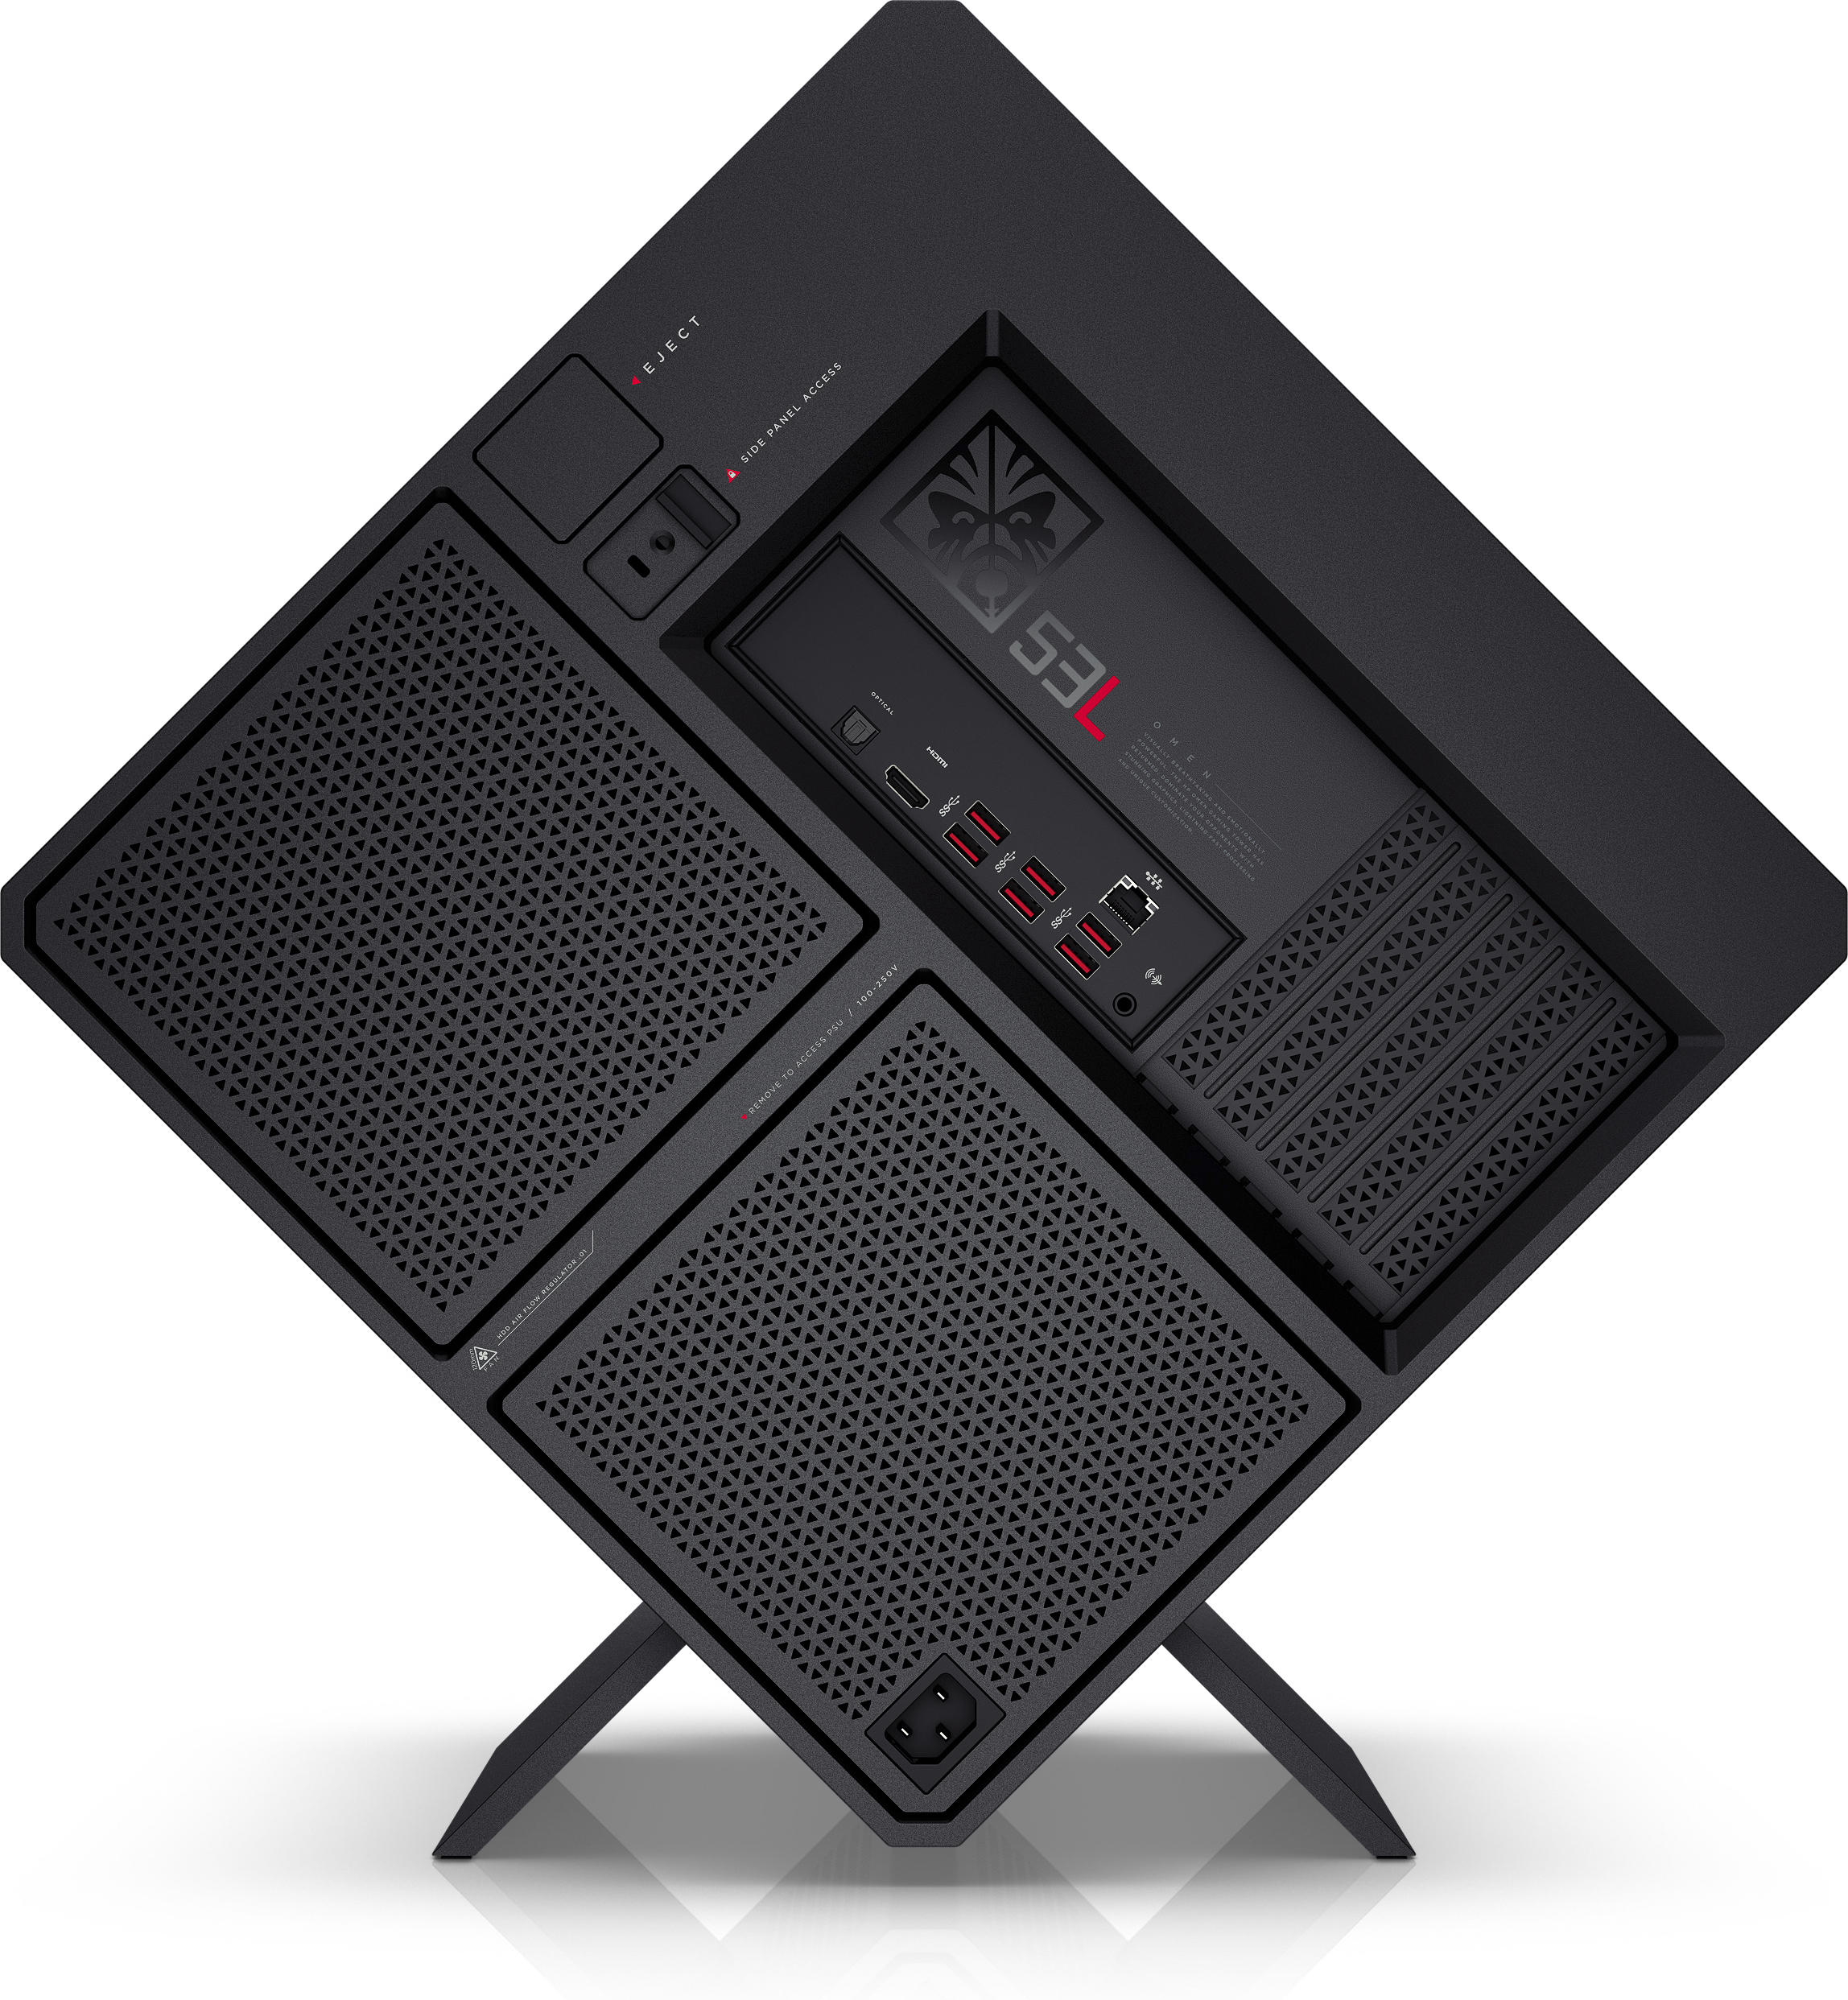 HP OMEN 900-085na 4GHz i7-6700K Scrivania Nero PC